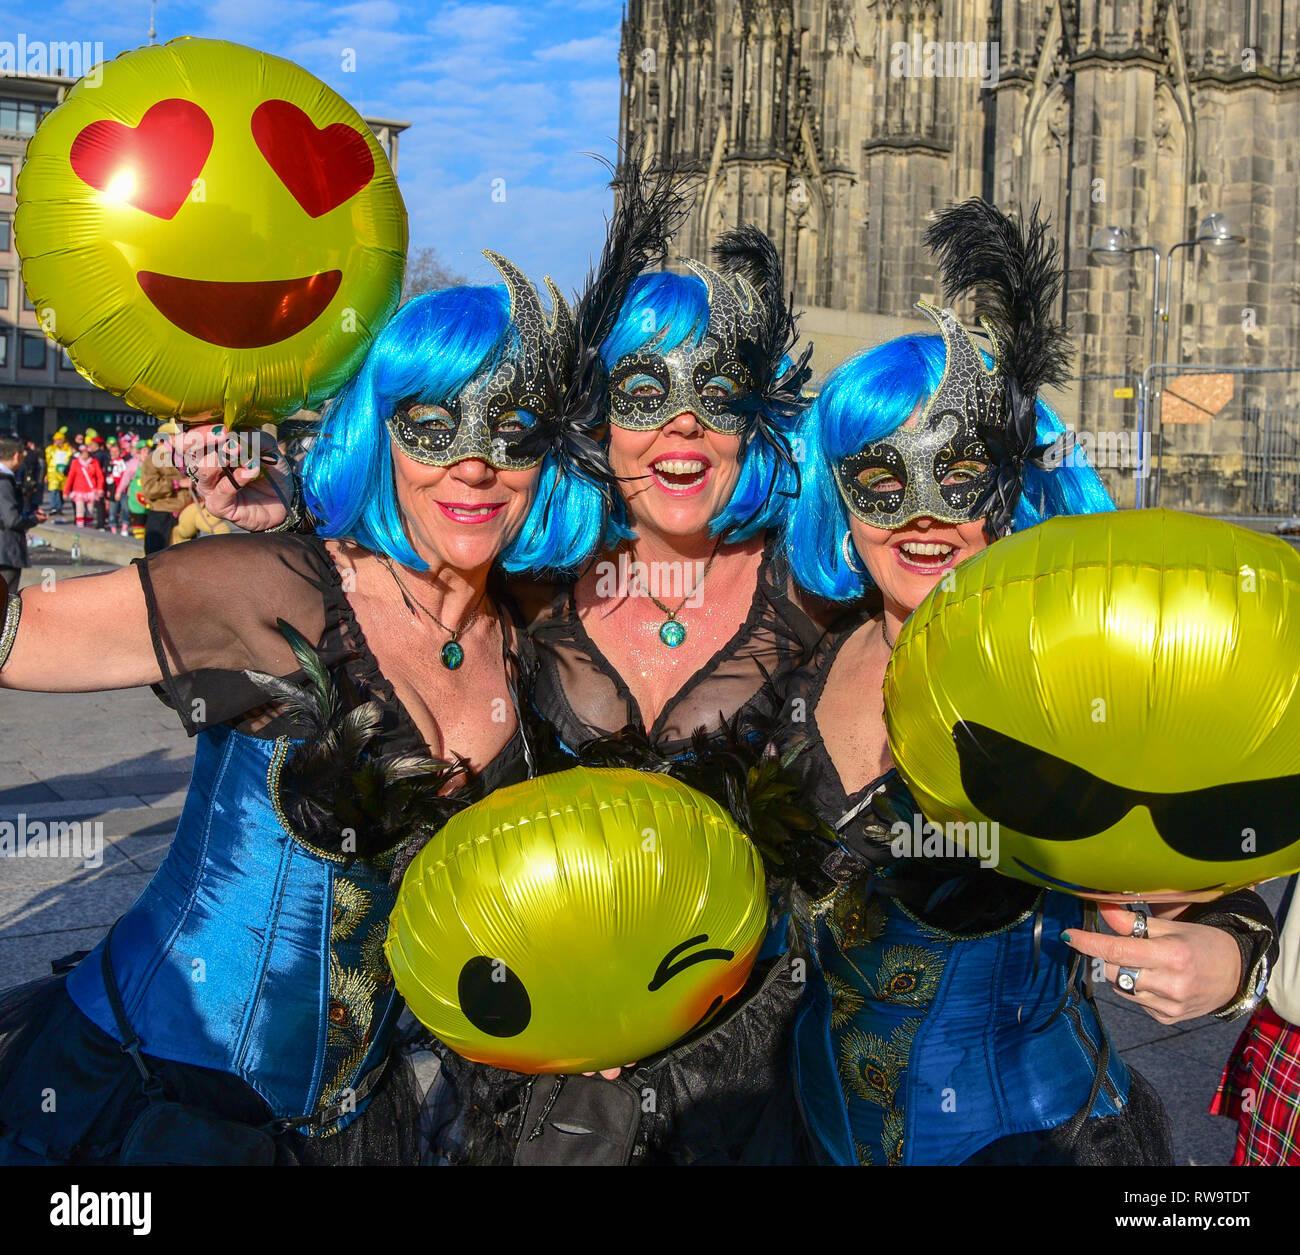 Jecken feiern Karneval in Köln Stockbild